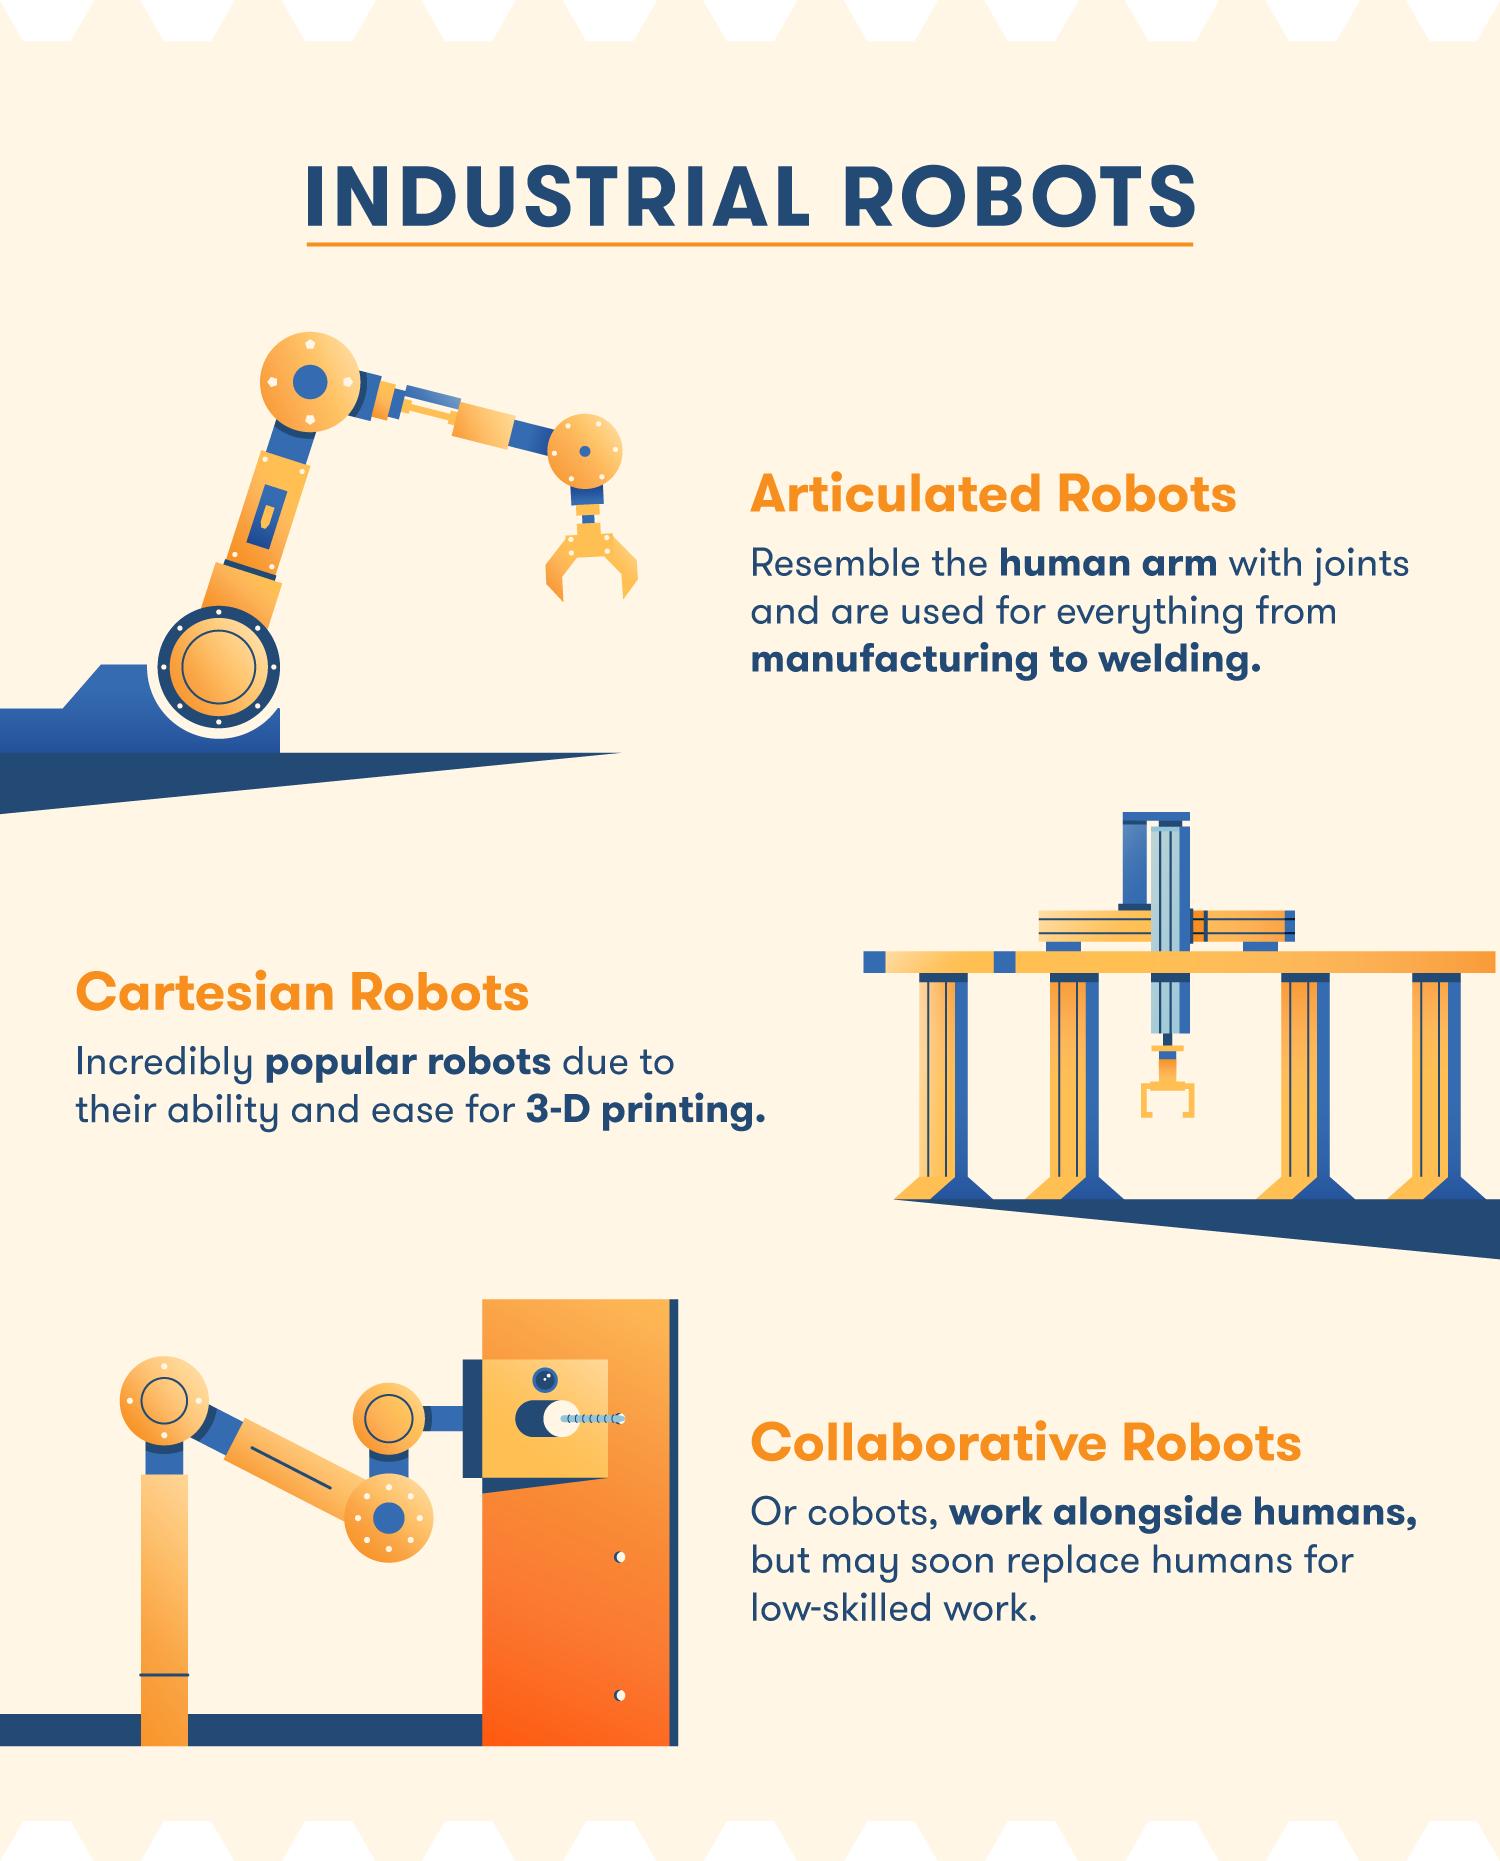 industrial robots - articulated robots cartesian robots collaborative robots